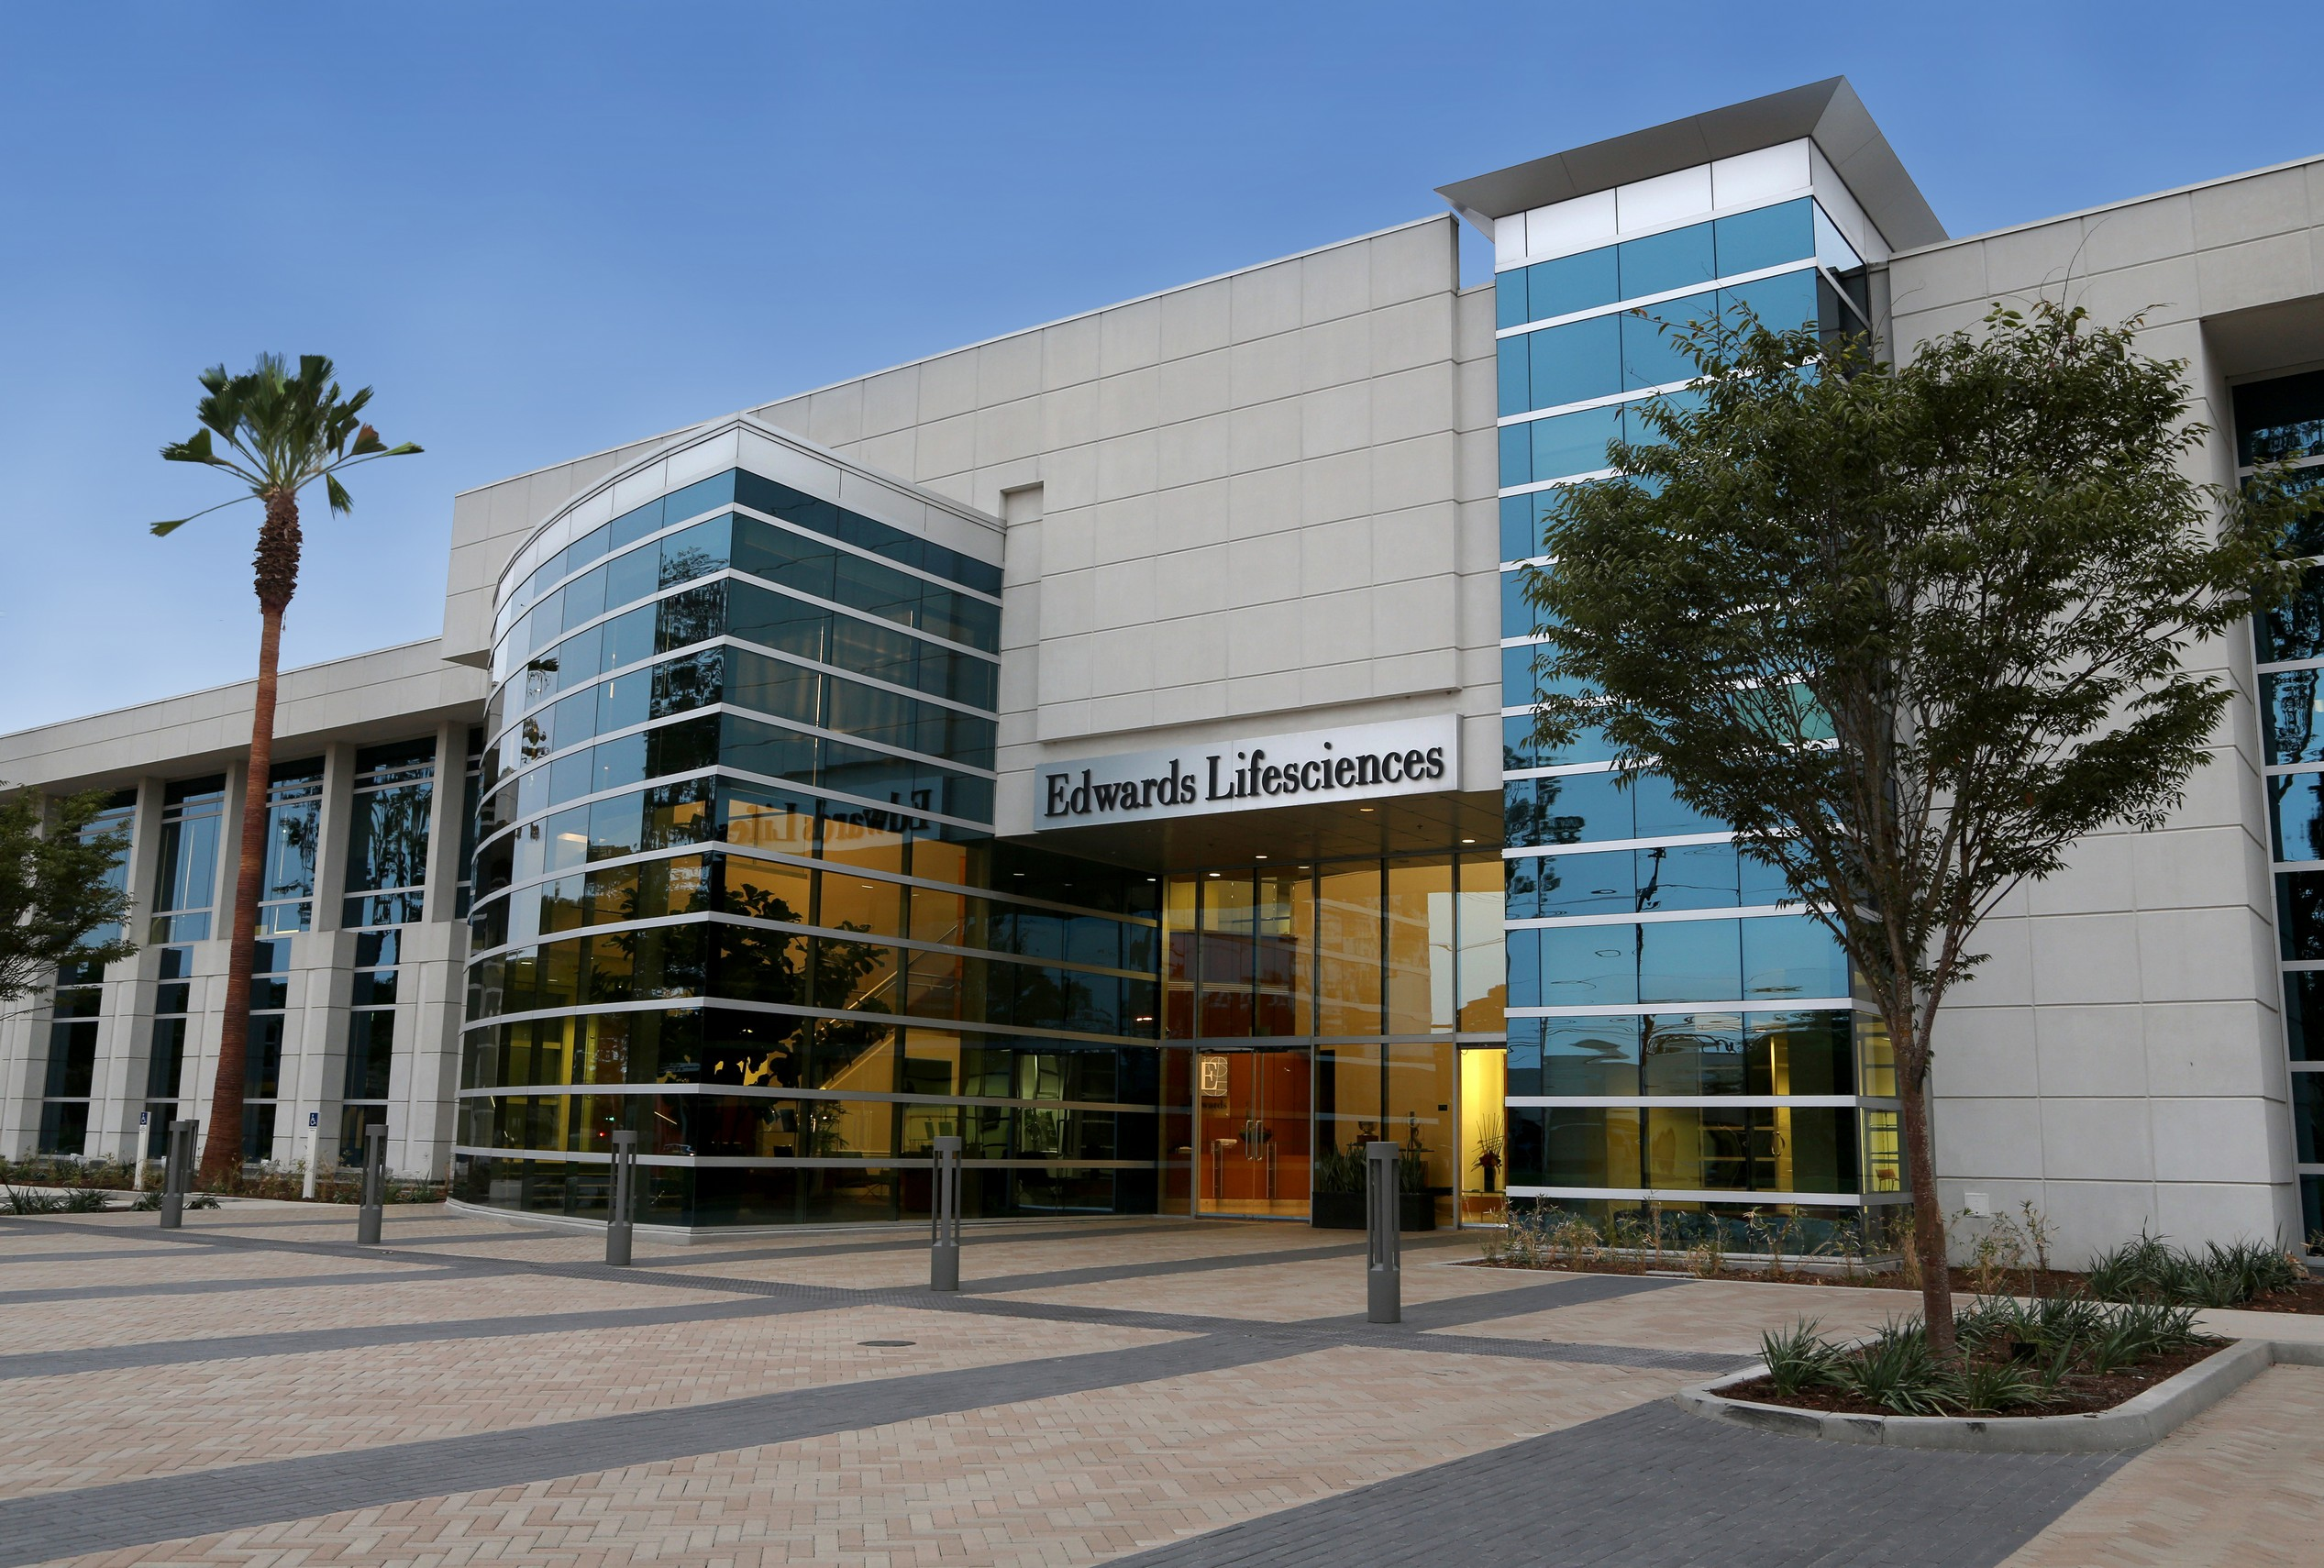 Edwards Lifesciences headquarters